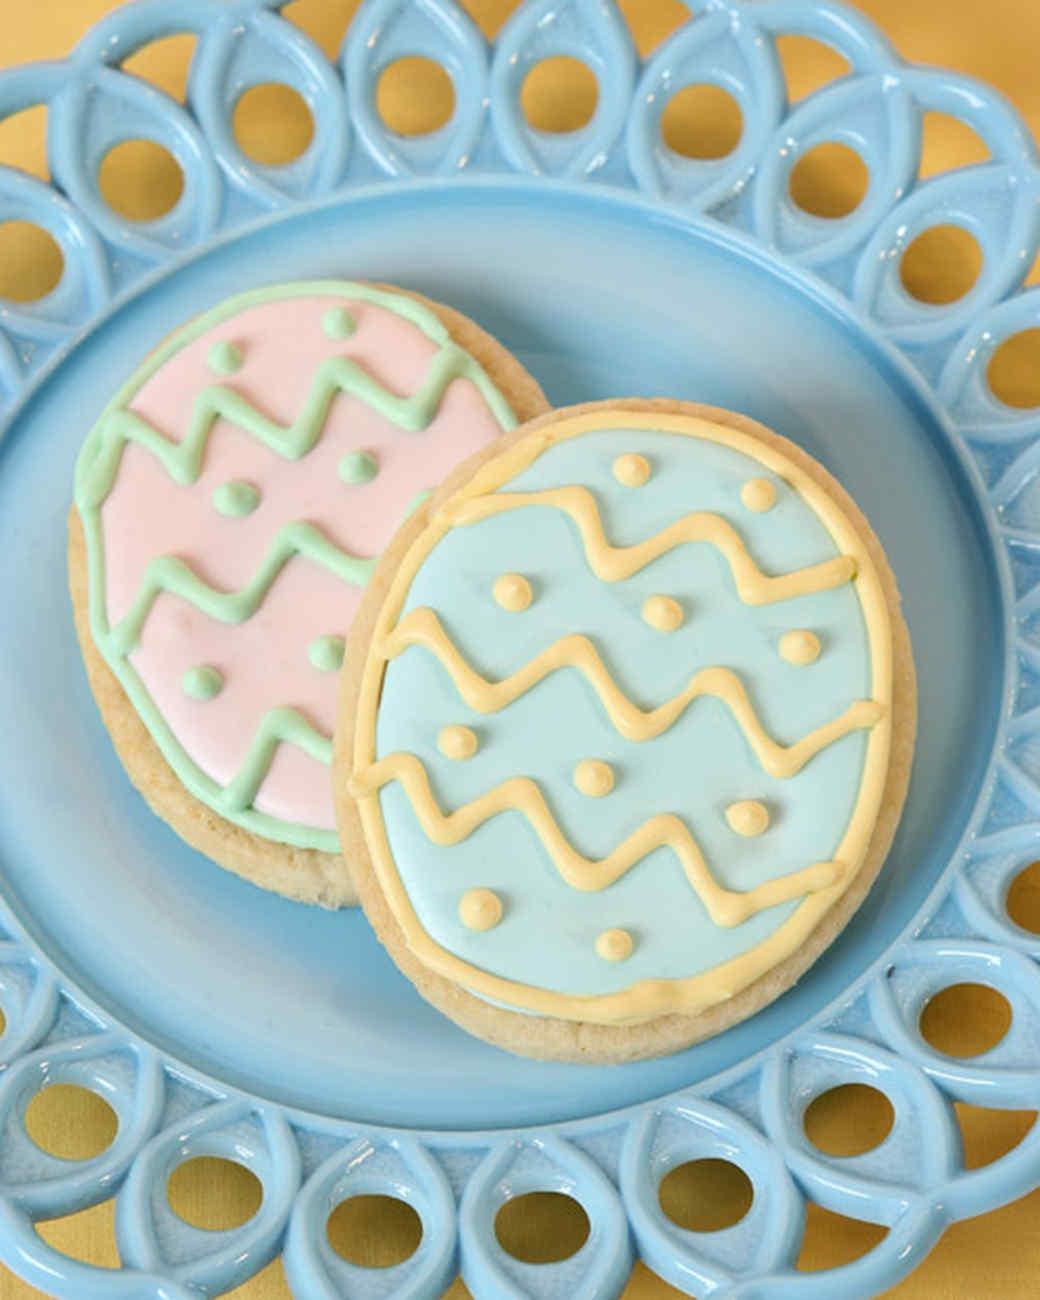 Ideal Sugar Cookies Recipe & Video